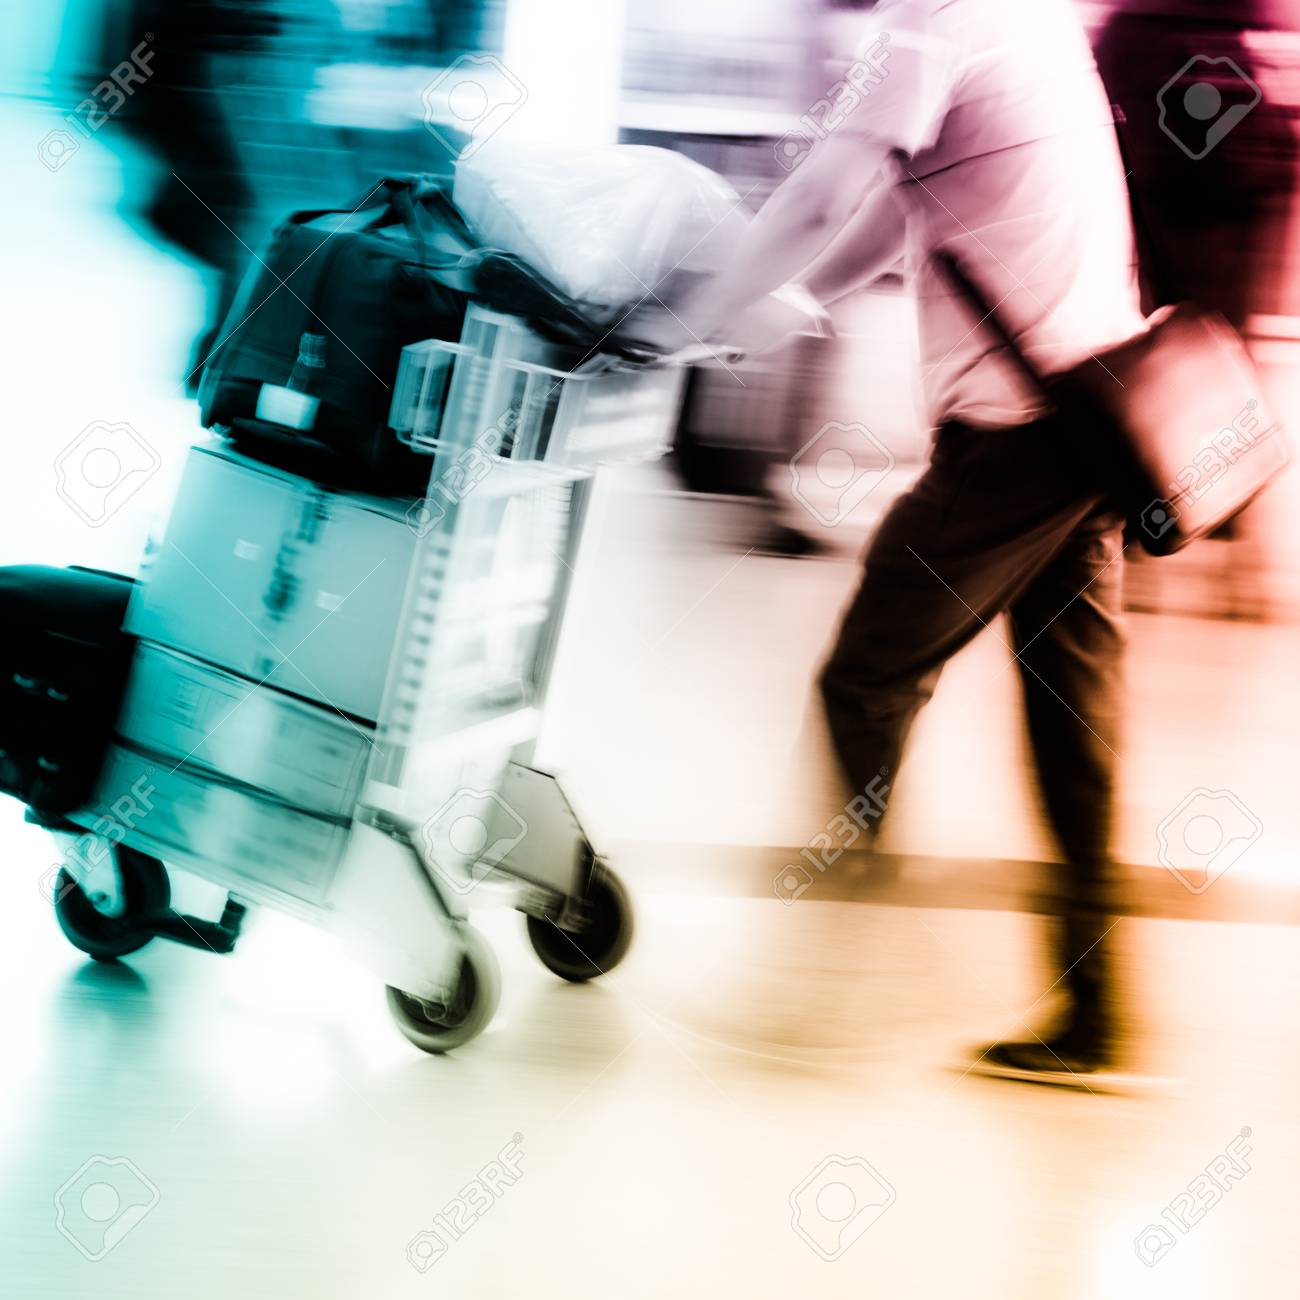 walking city passenger blur motion Stock Photo - 15527807